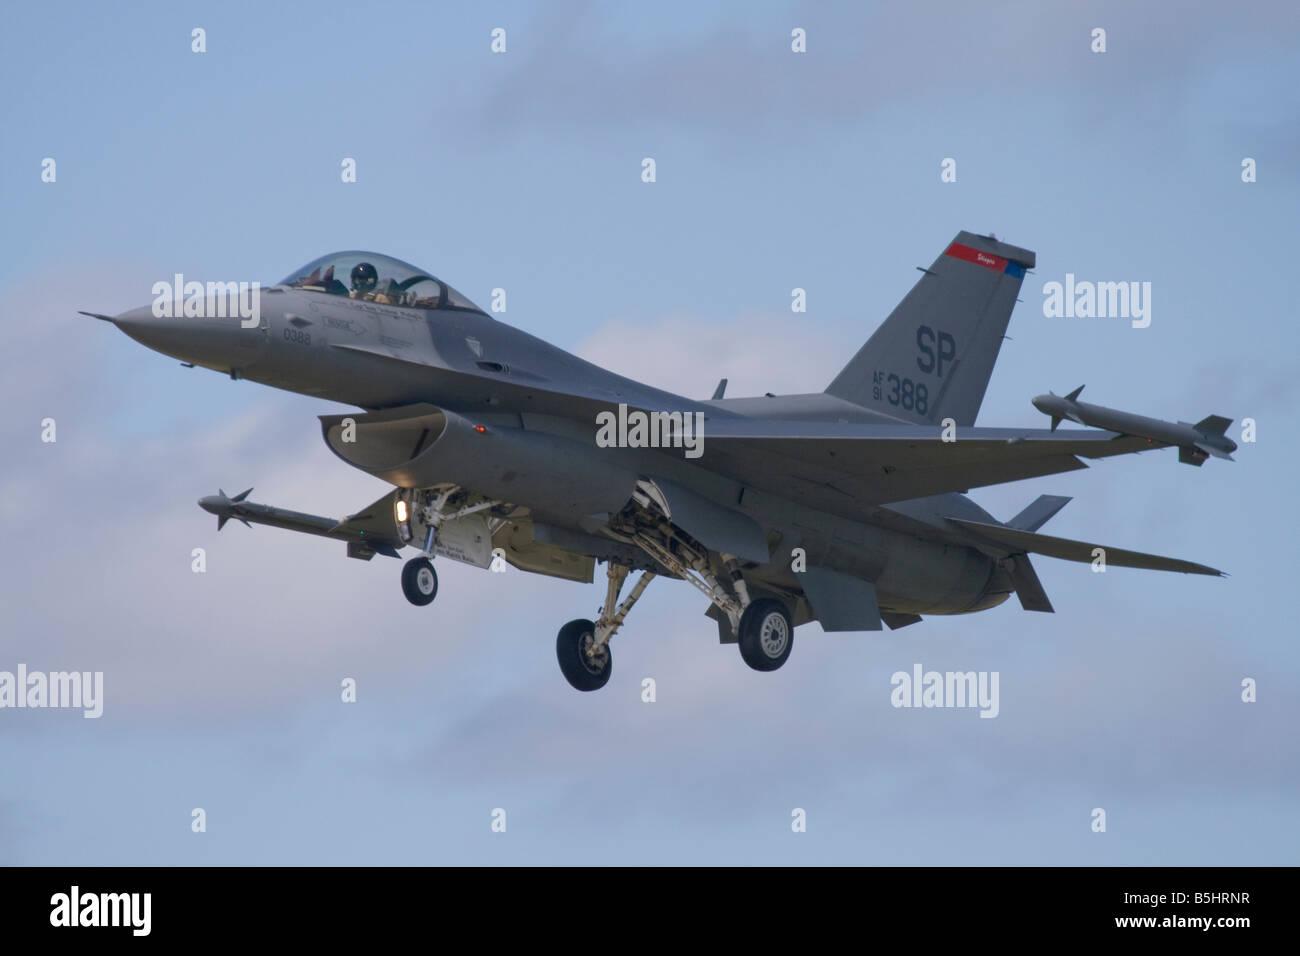 Lockheed Martin F 16 Fighting Falcon - Stock Image